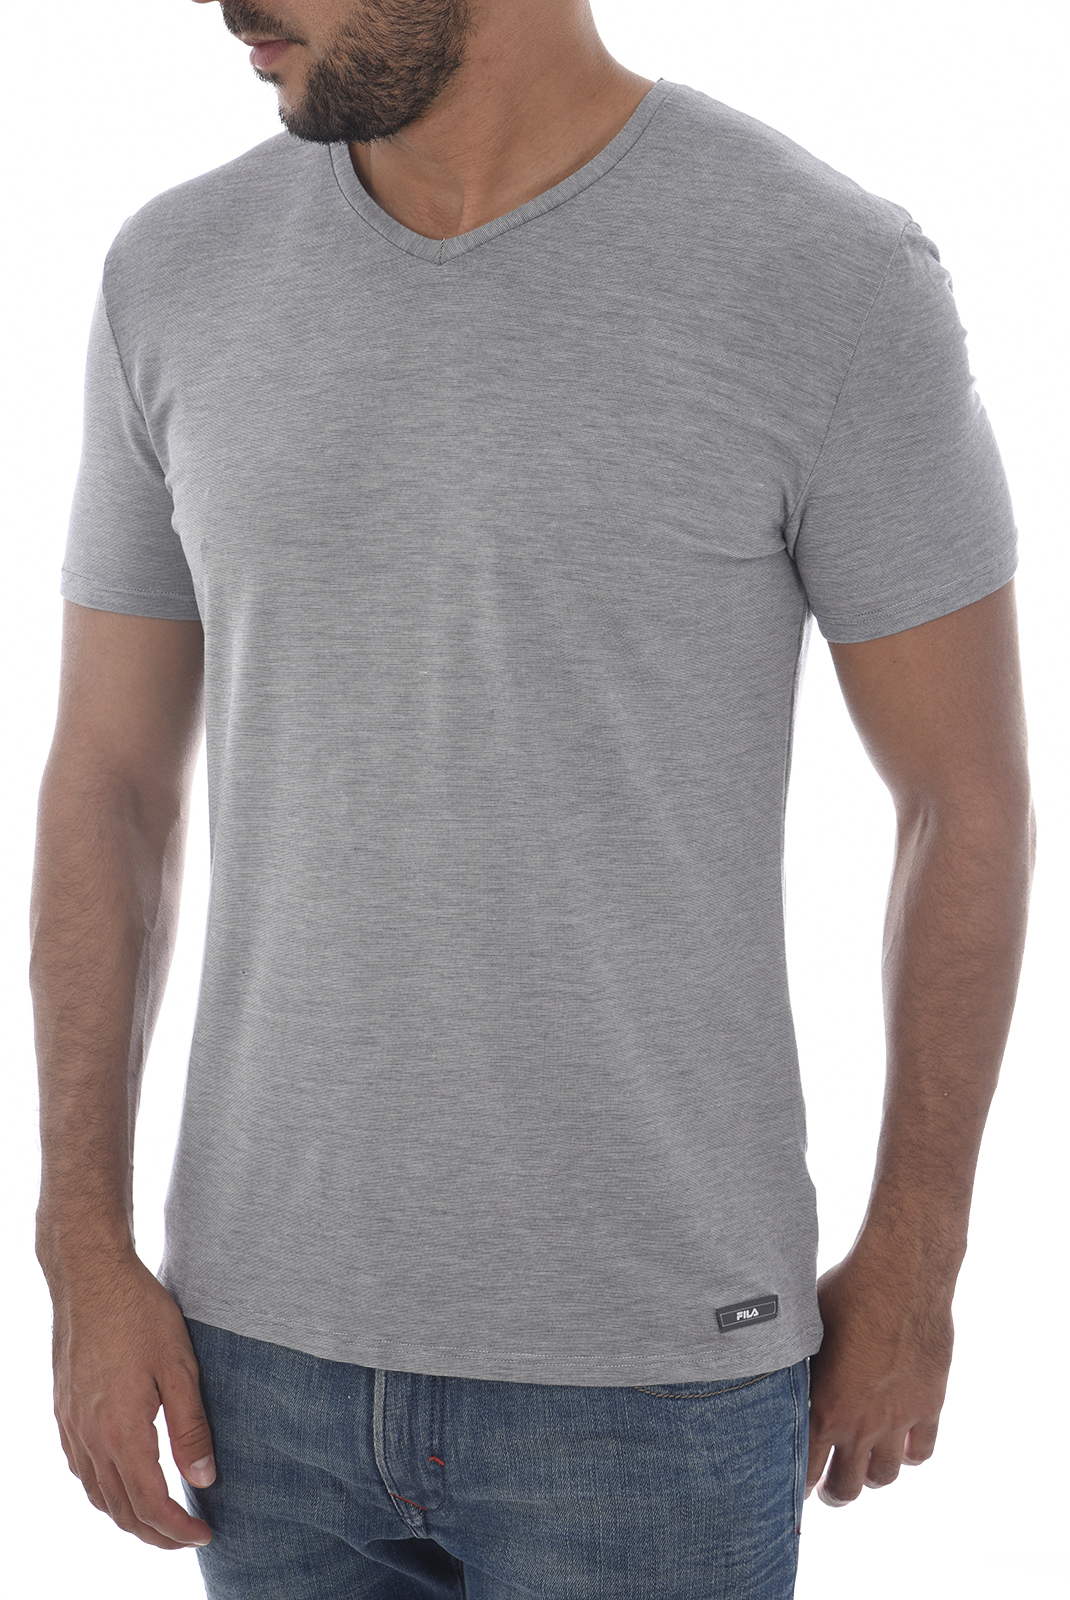 Tee-shirts  Fila F06I4 0EG-MICRO RIGATO GRIGIO